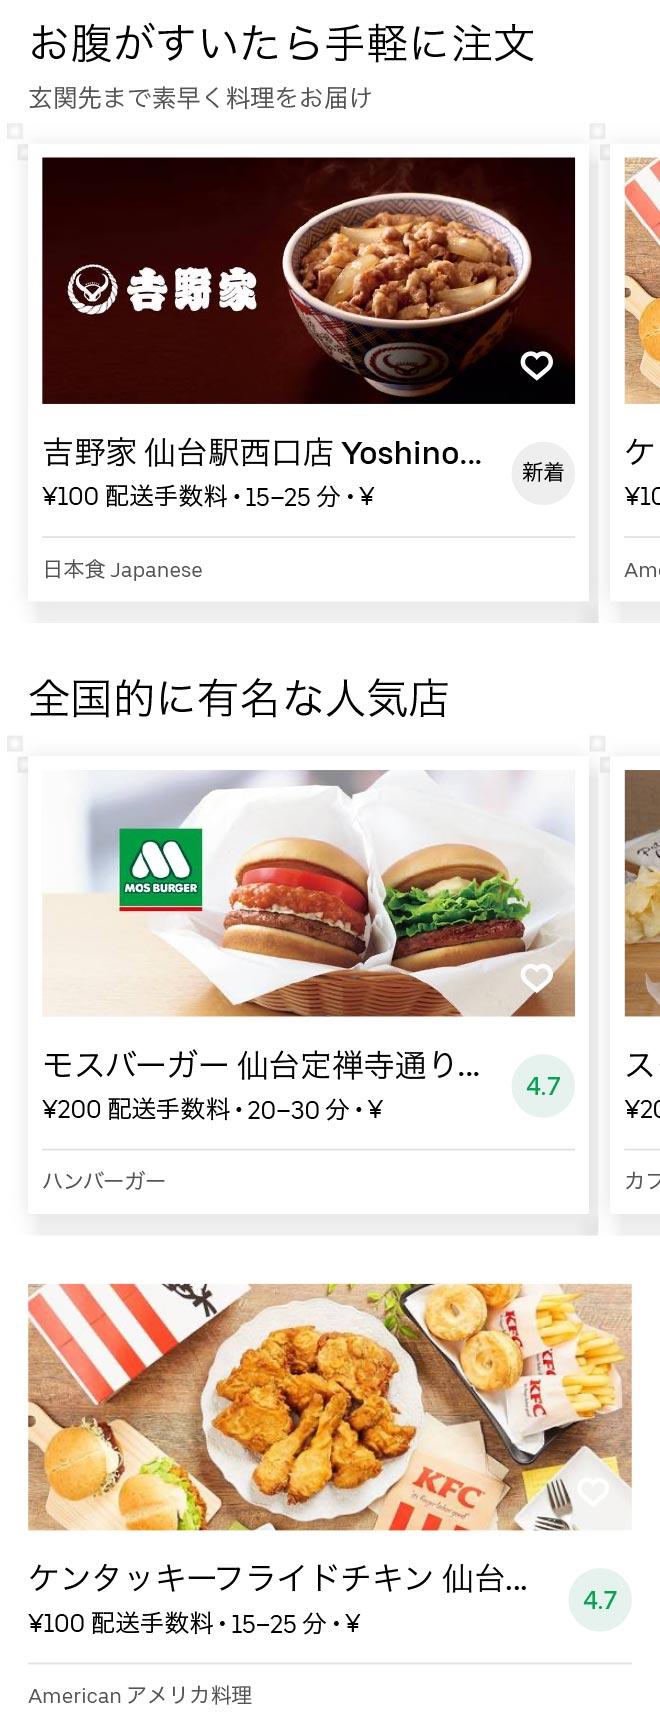 Sendai menu 2008 03